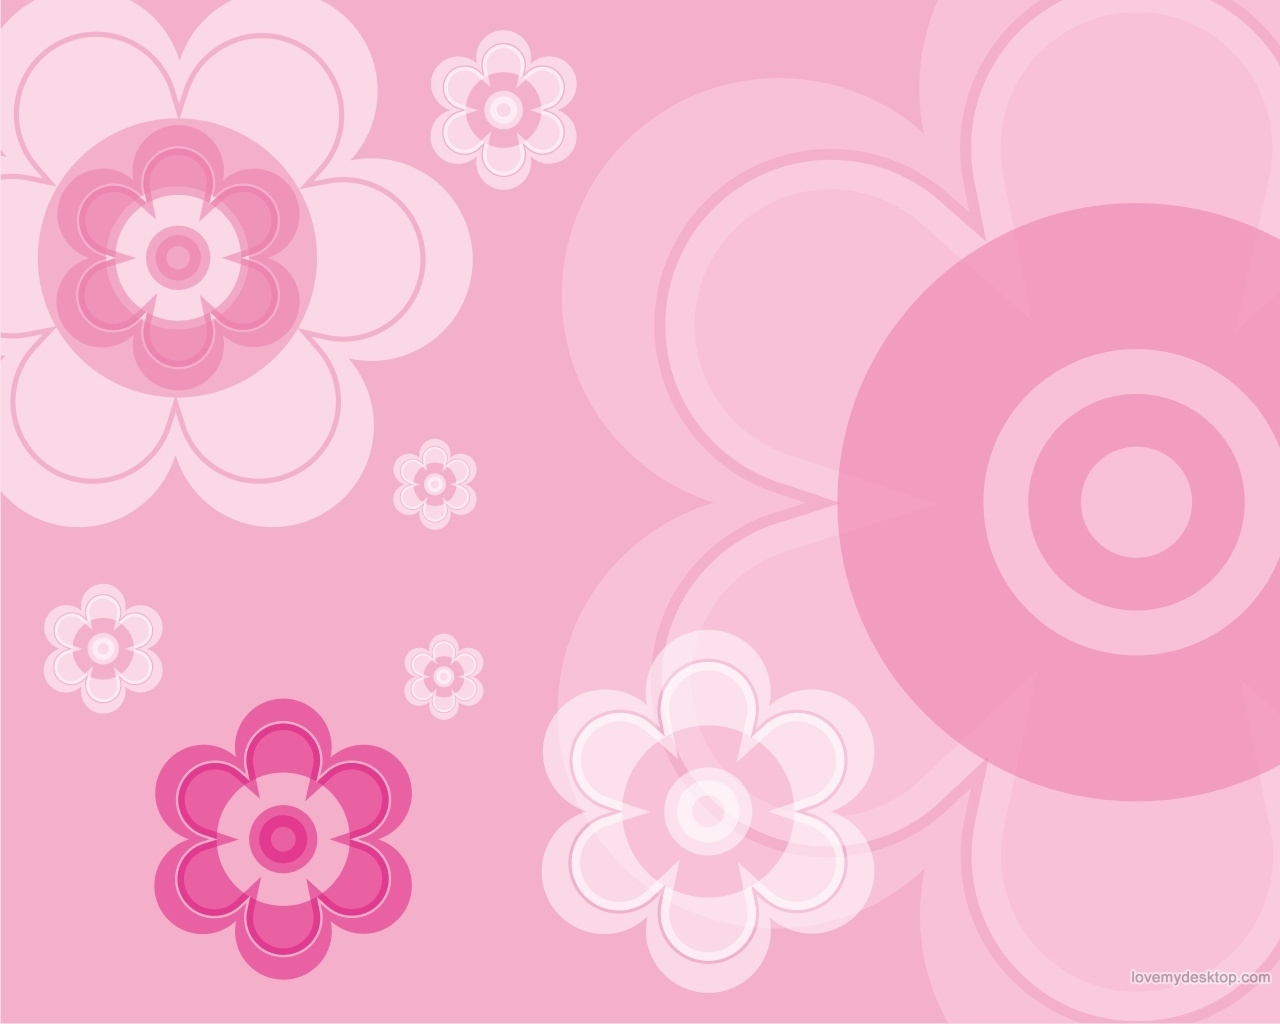 44+ Colorful Girly Wallpapers on WallpaperSafari